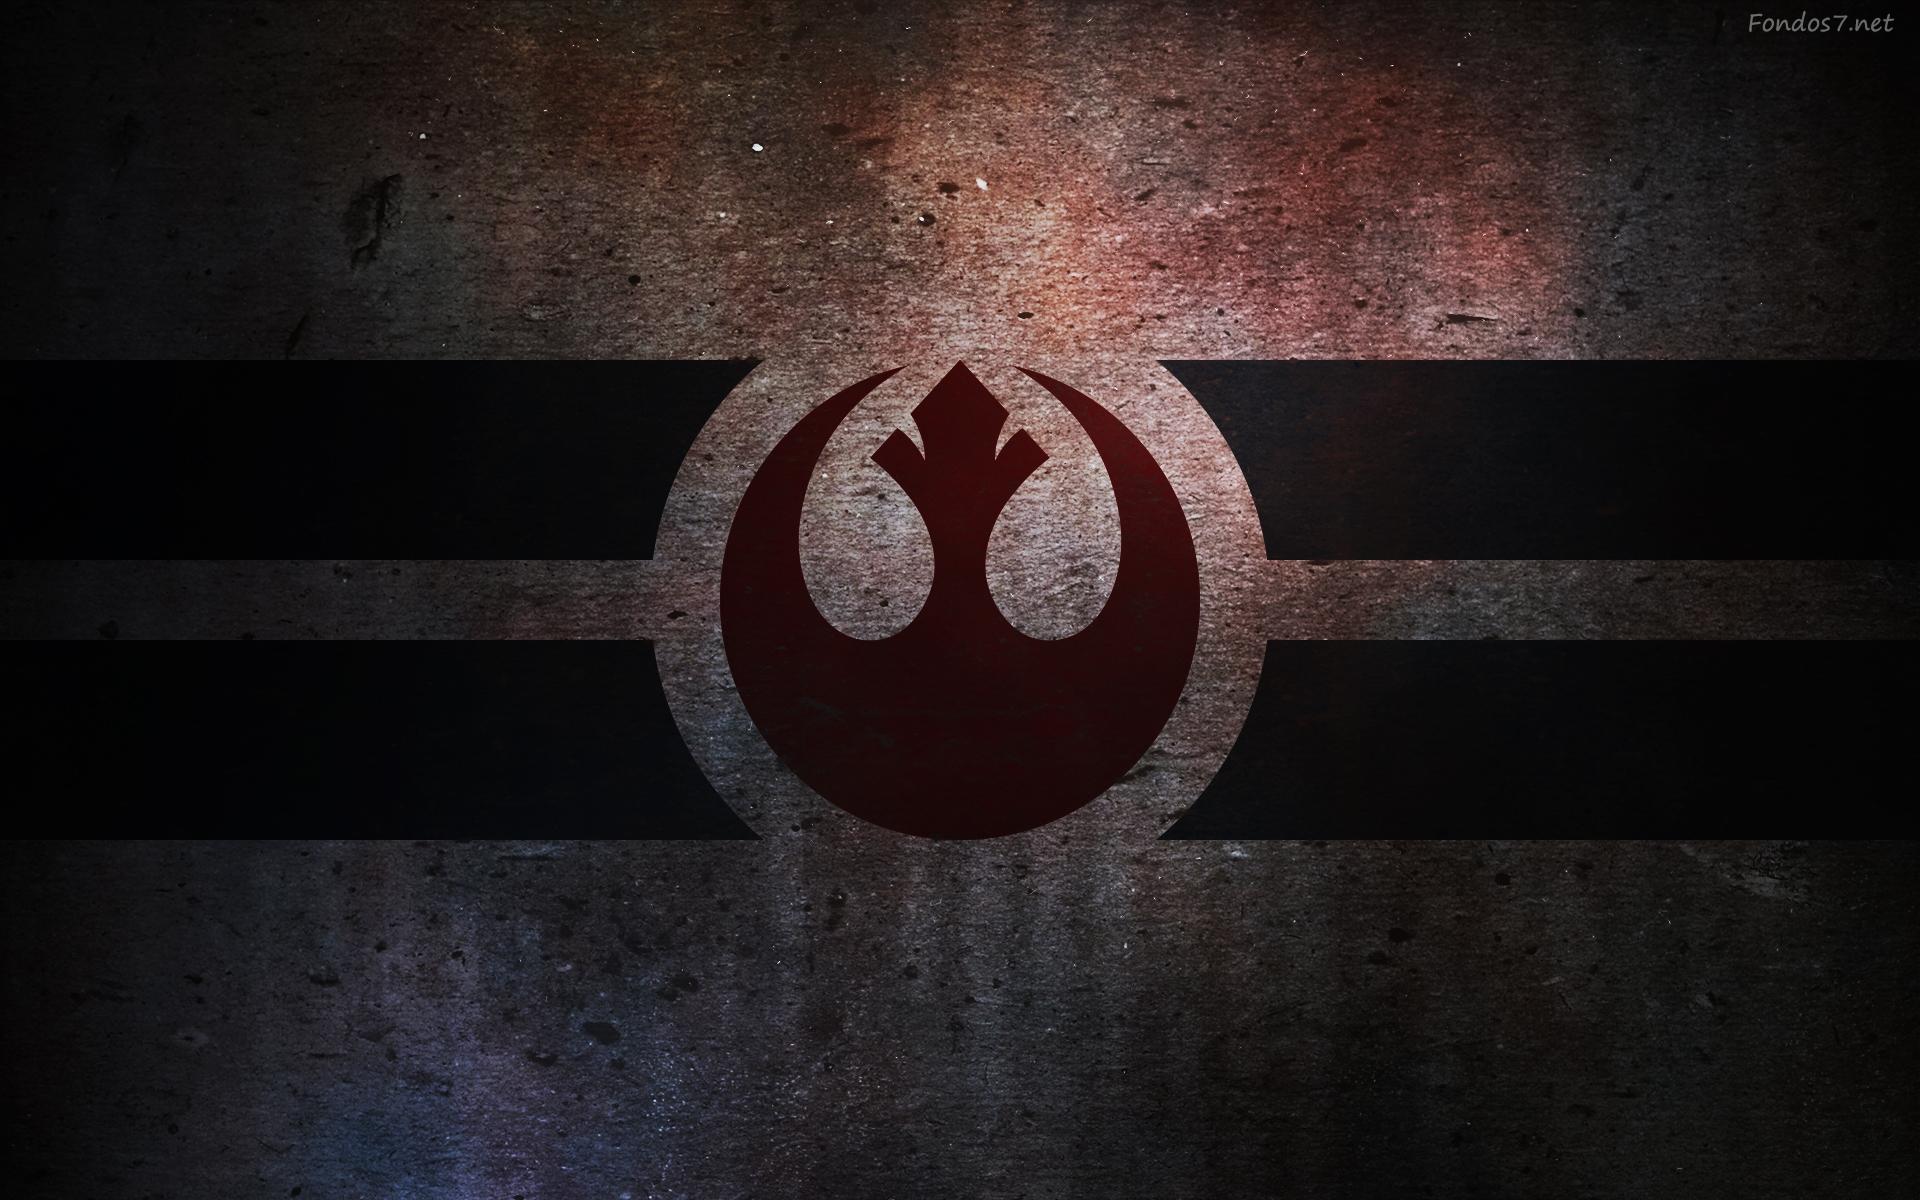 free lego star wars wallpaper